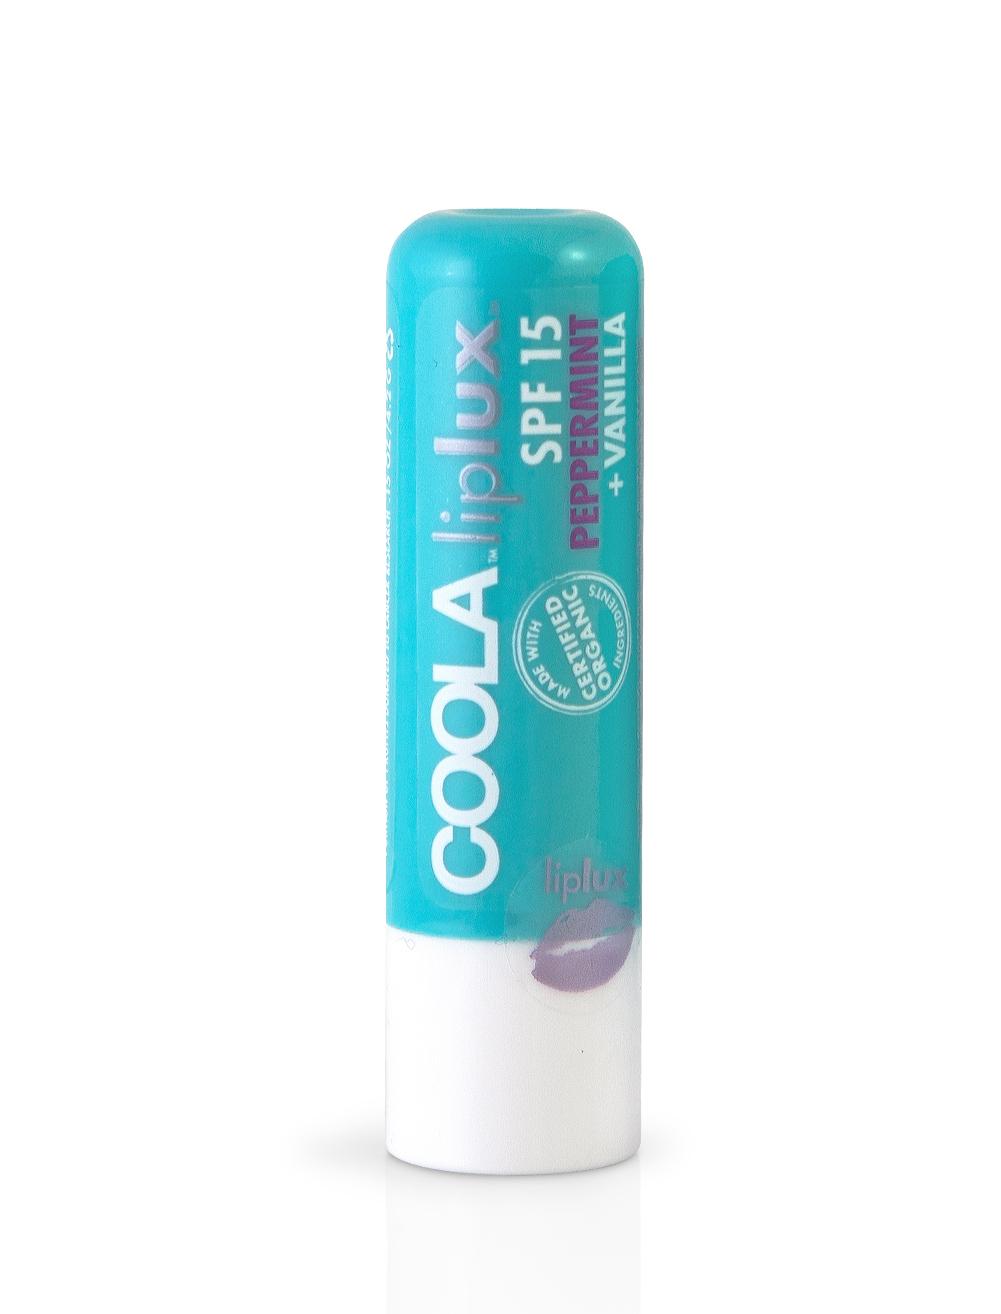 http://www.solescapes.com/COOLA-Liplux-Peppermint-Vanilla-SPF-15-p/cs-ll15vp.htm